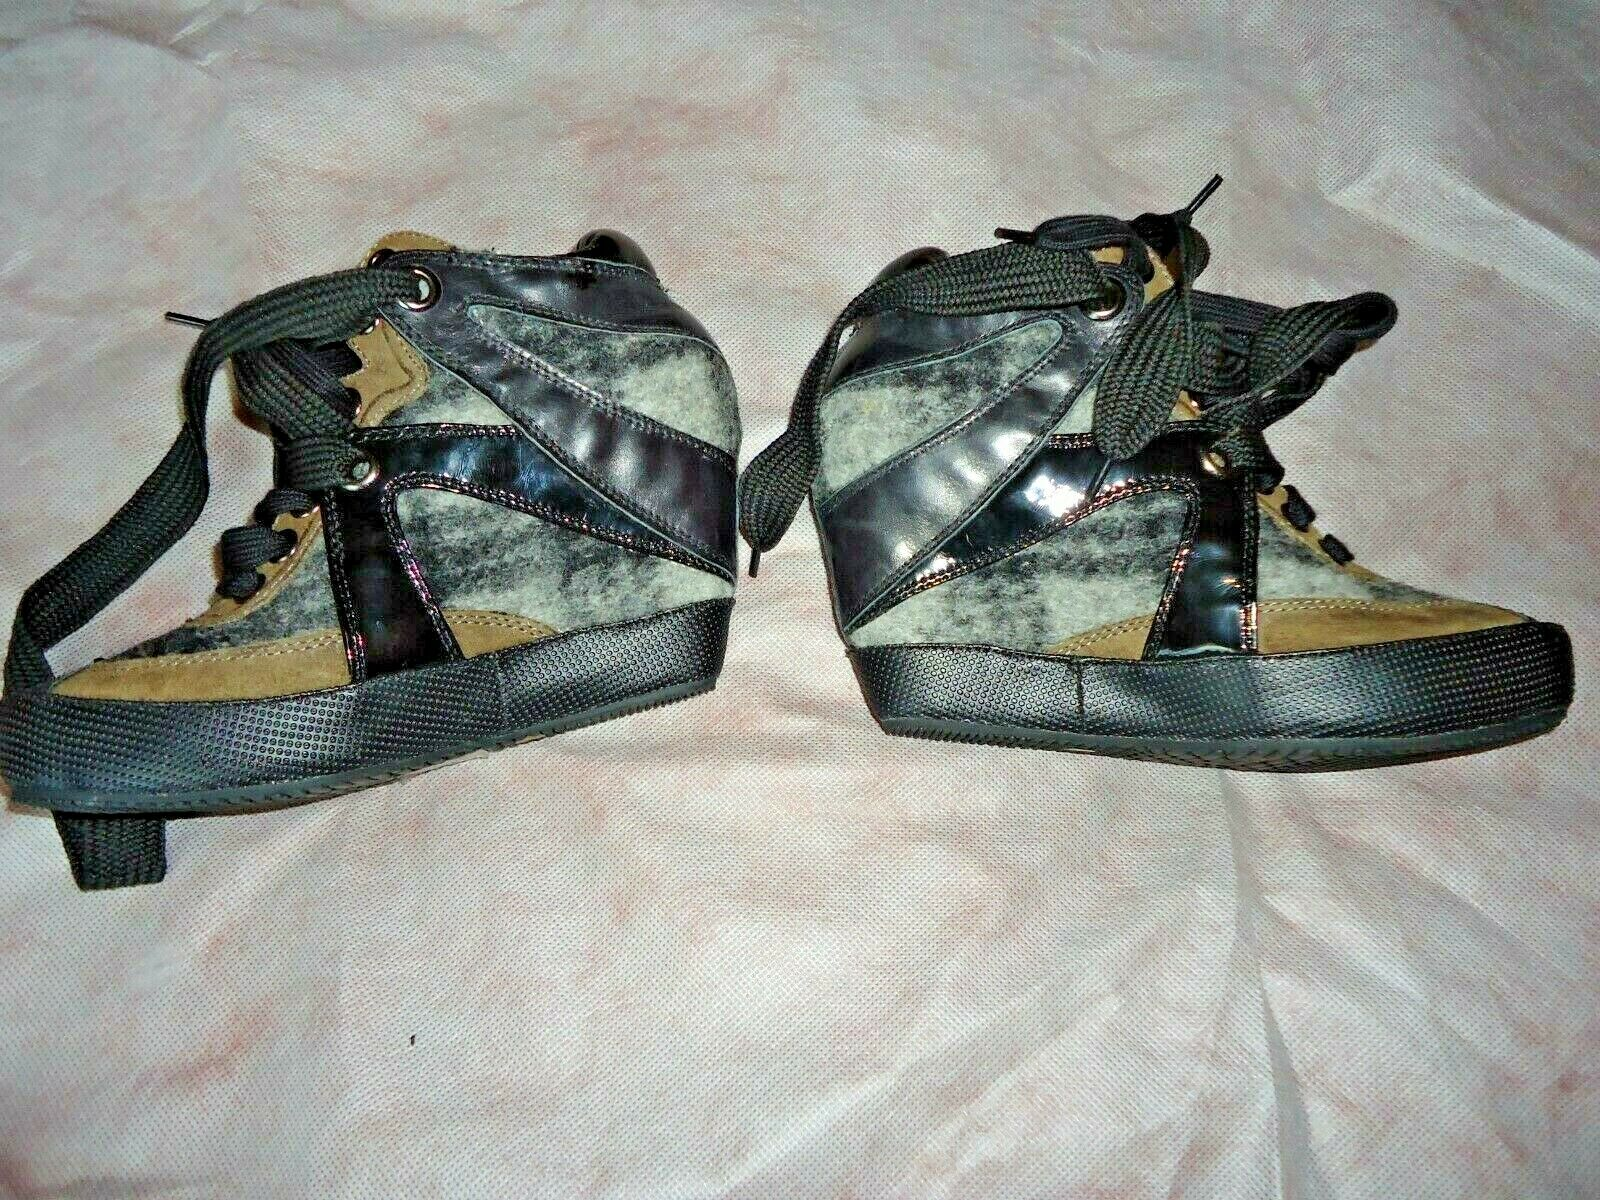 New LOGAN LOGAN LOGAN CROSSING women wedge shoes size 7 (40) fdda0d